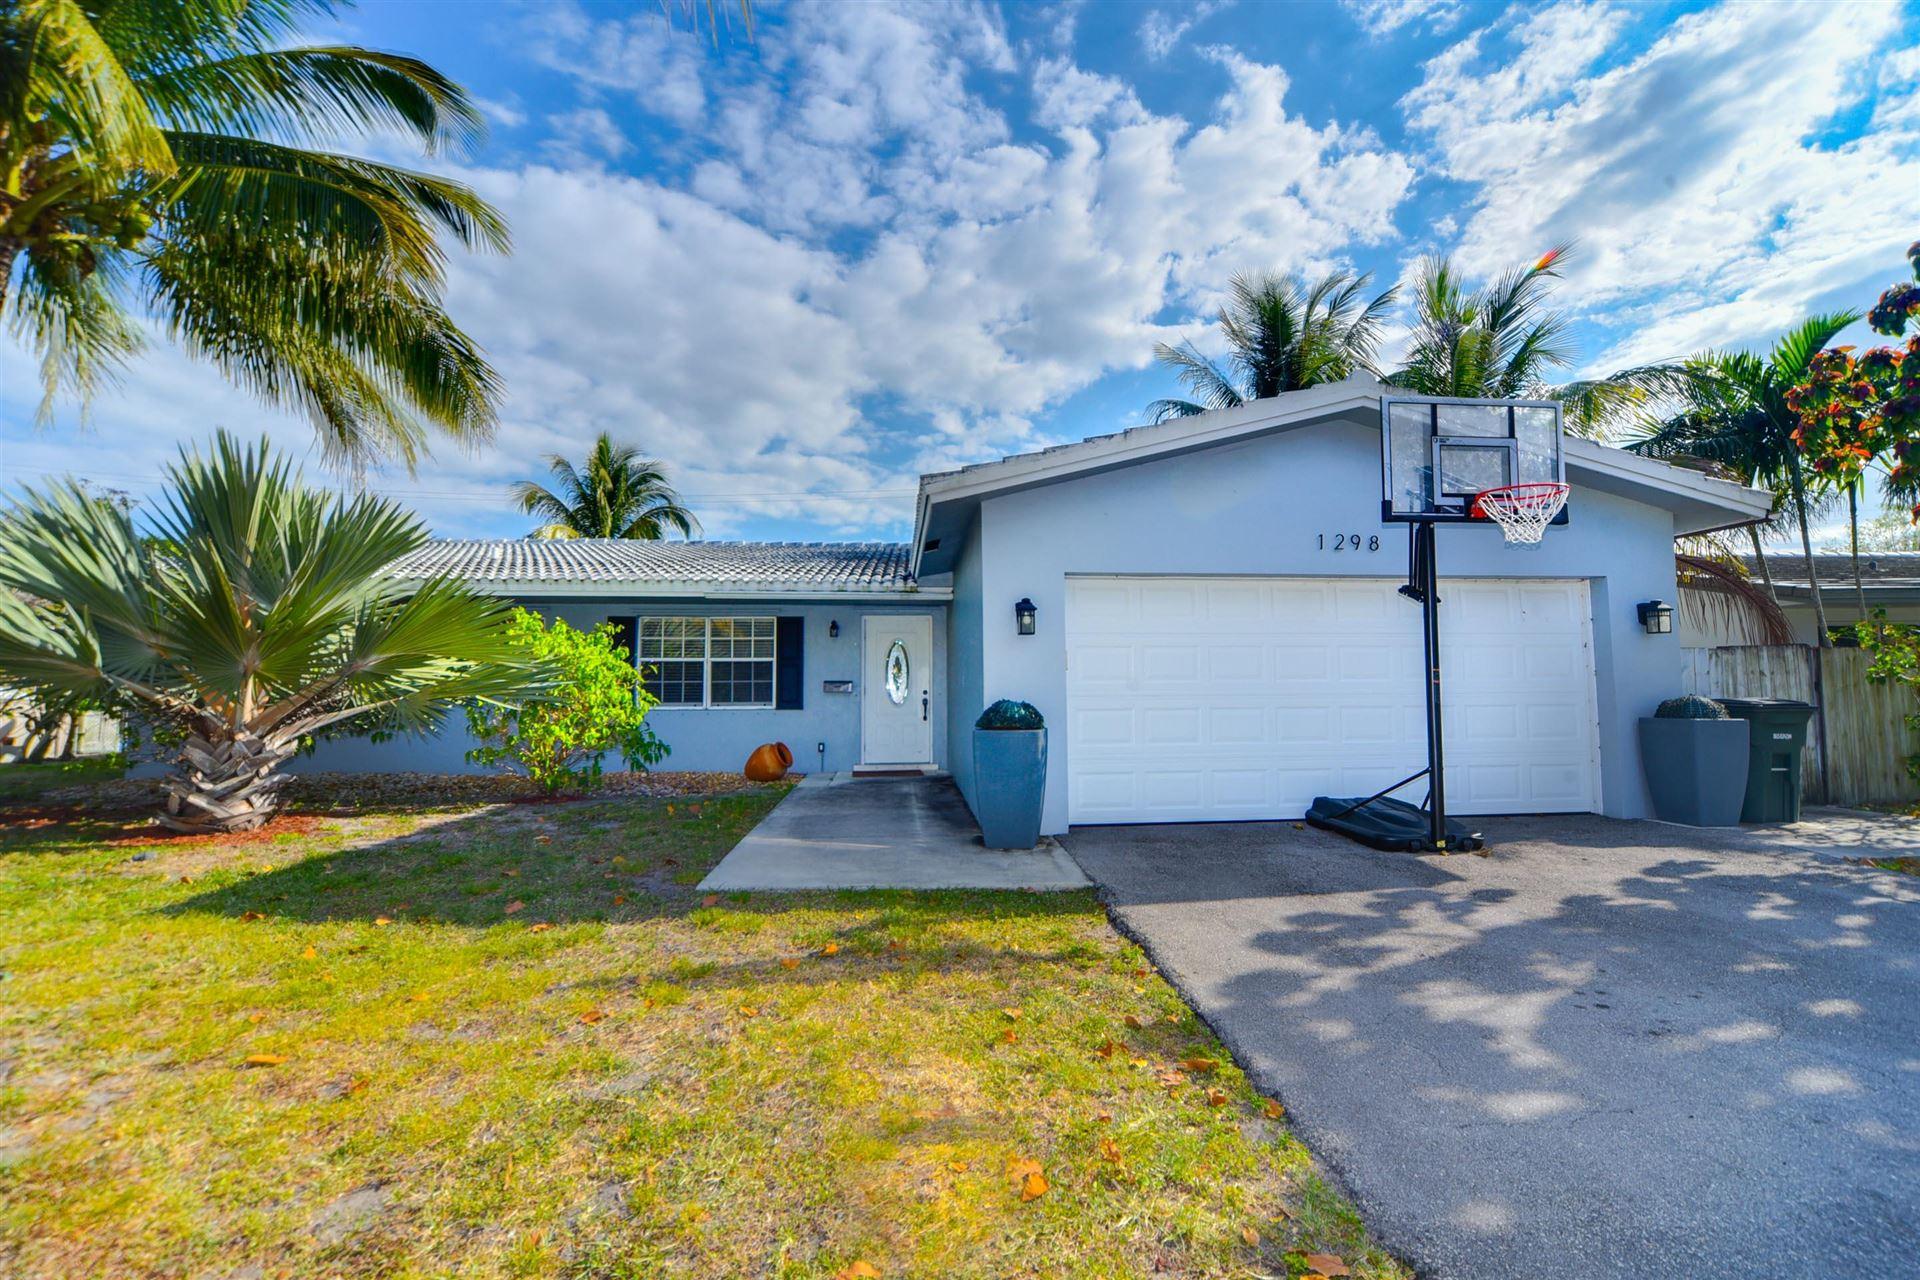 1298 SW 13th Street, Boca Raton, FL 33486 - #: RX-10701605